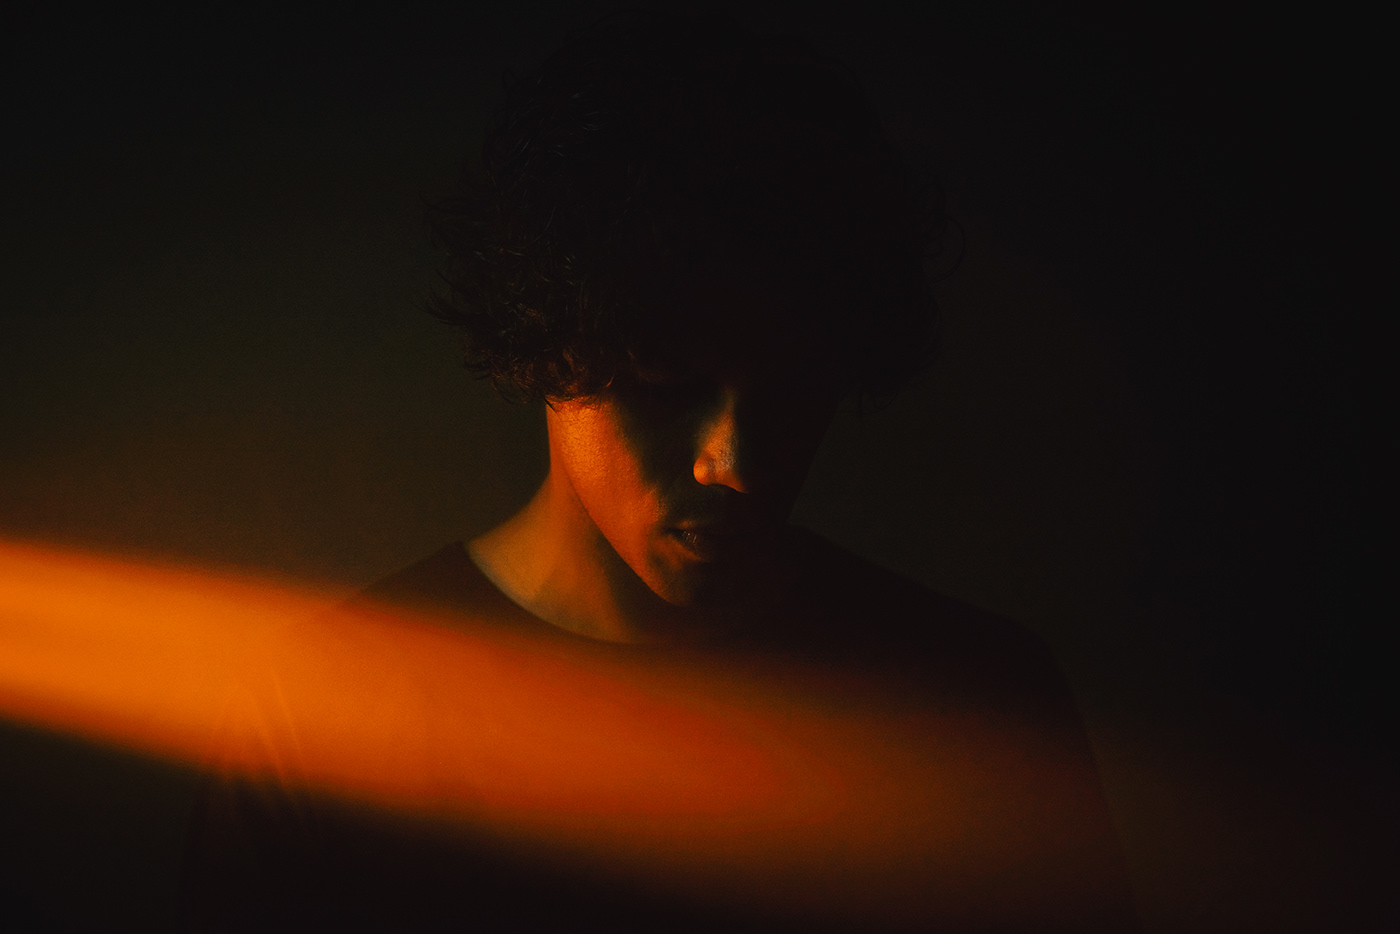 dj light lightroom music Photography  photoshoot photoshop portrait sonyalpha studio